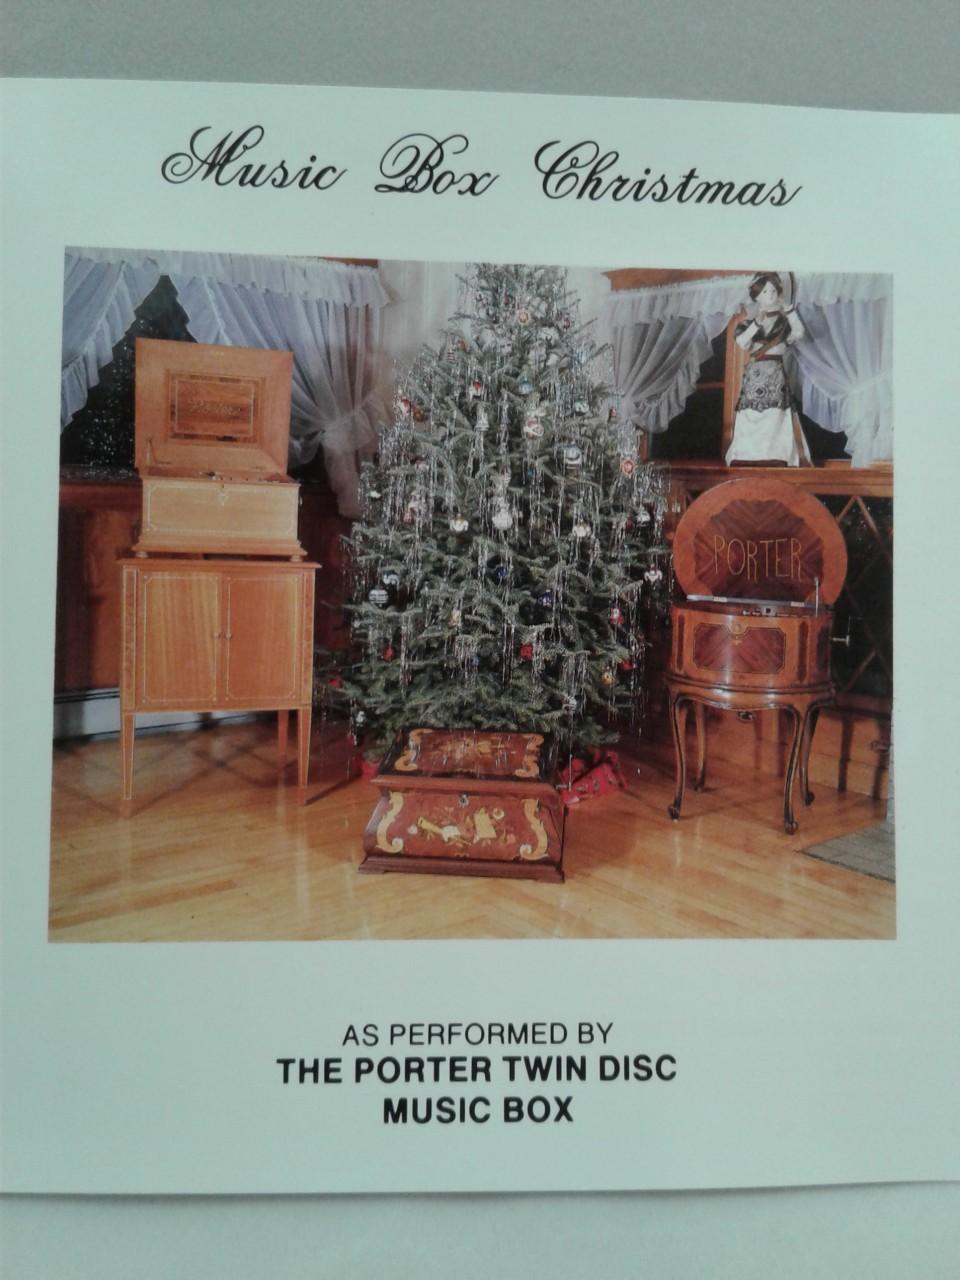 Music Box Christmas - Porter Music Box Company